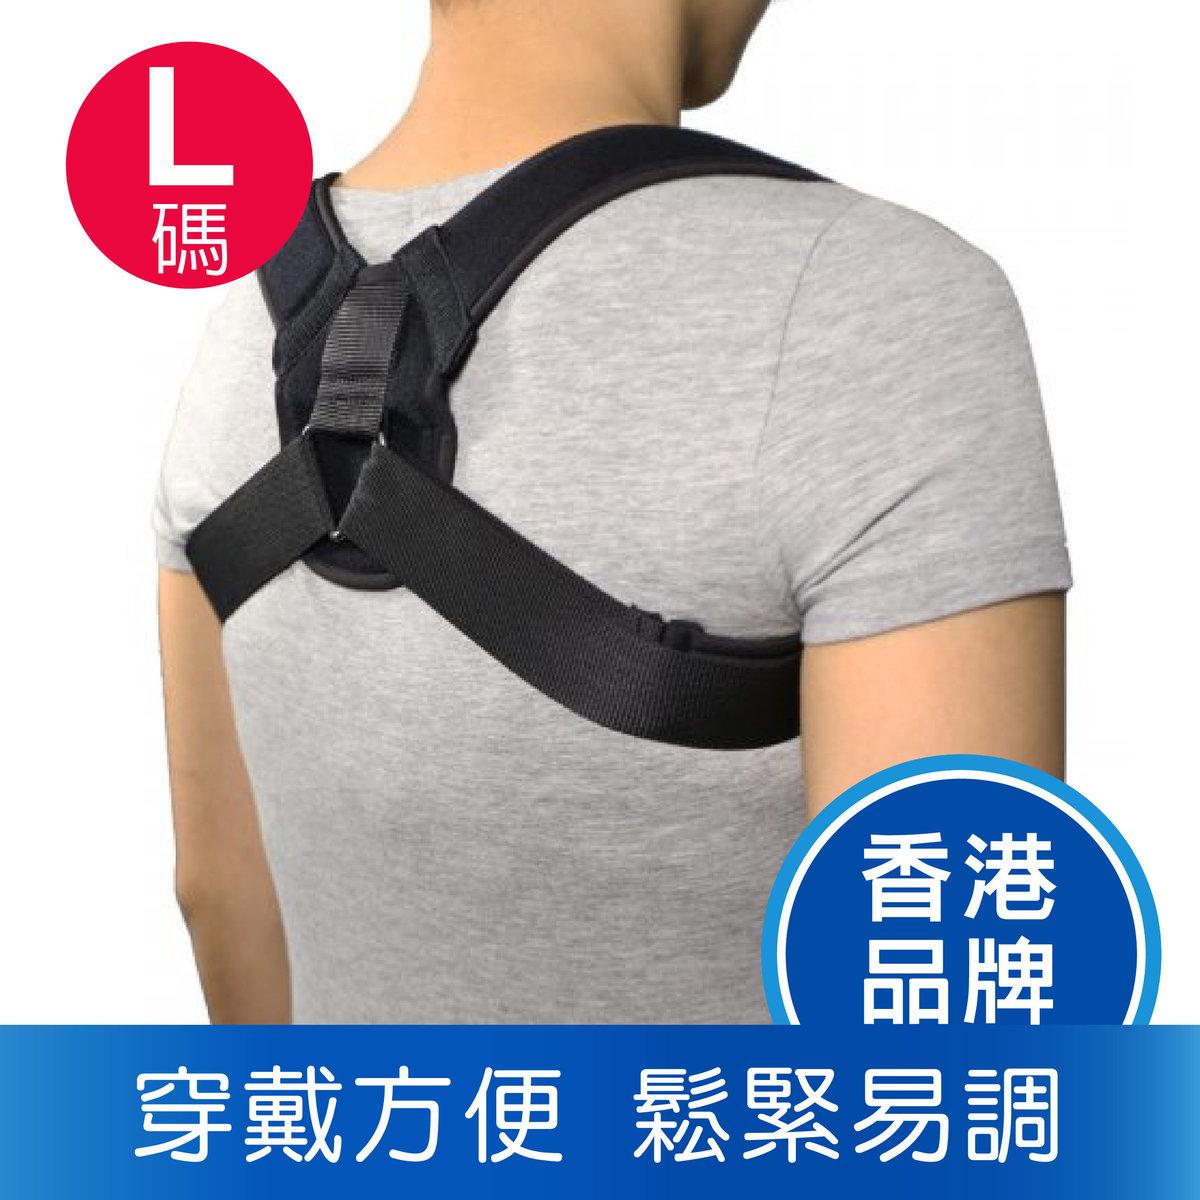 Posture Support Size L